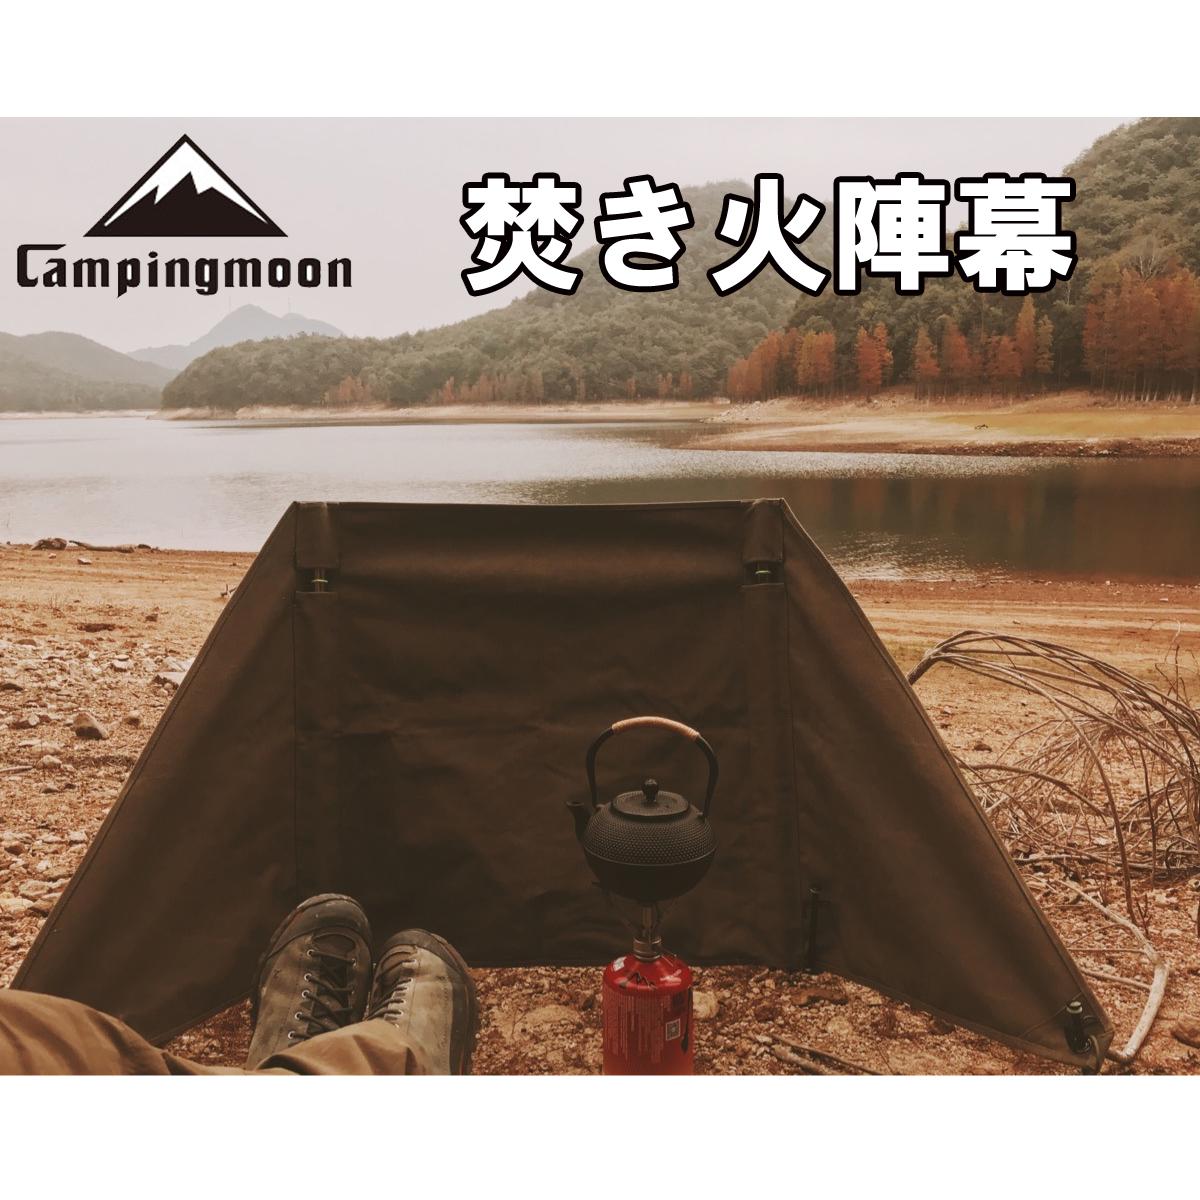 camping moon 焚き火陣幕・リフレクター